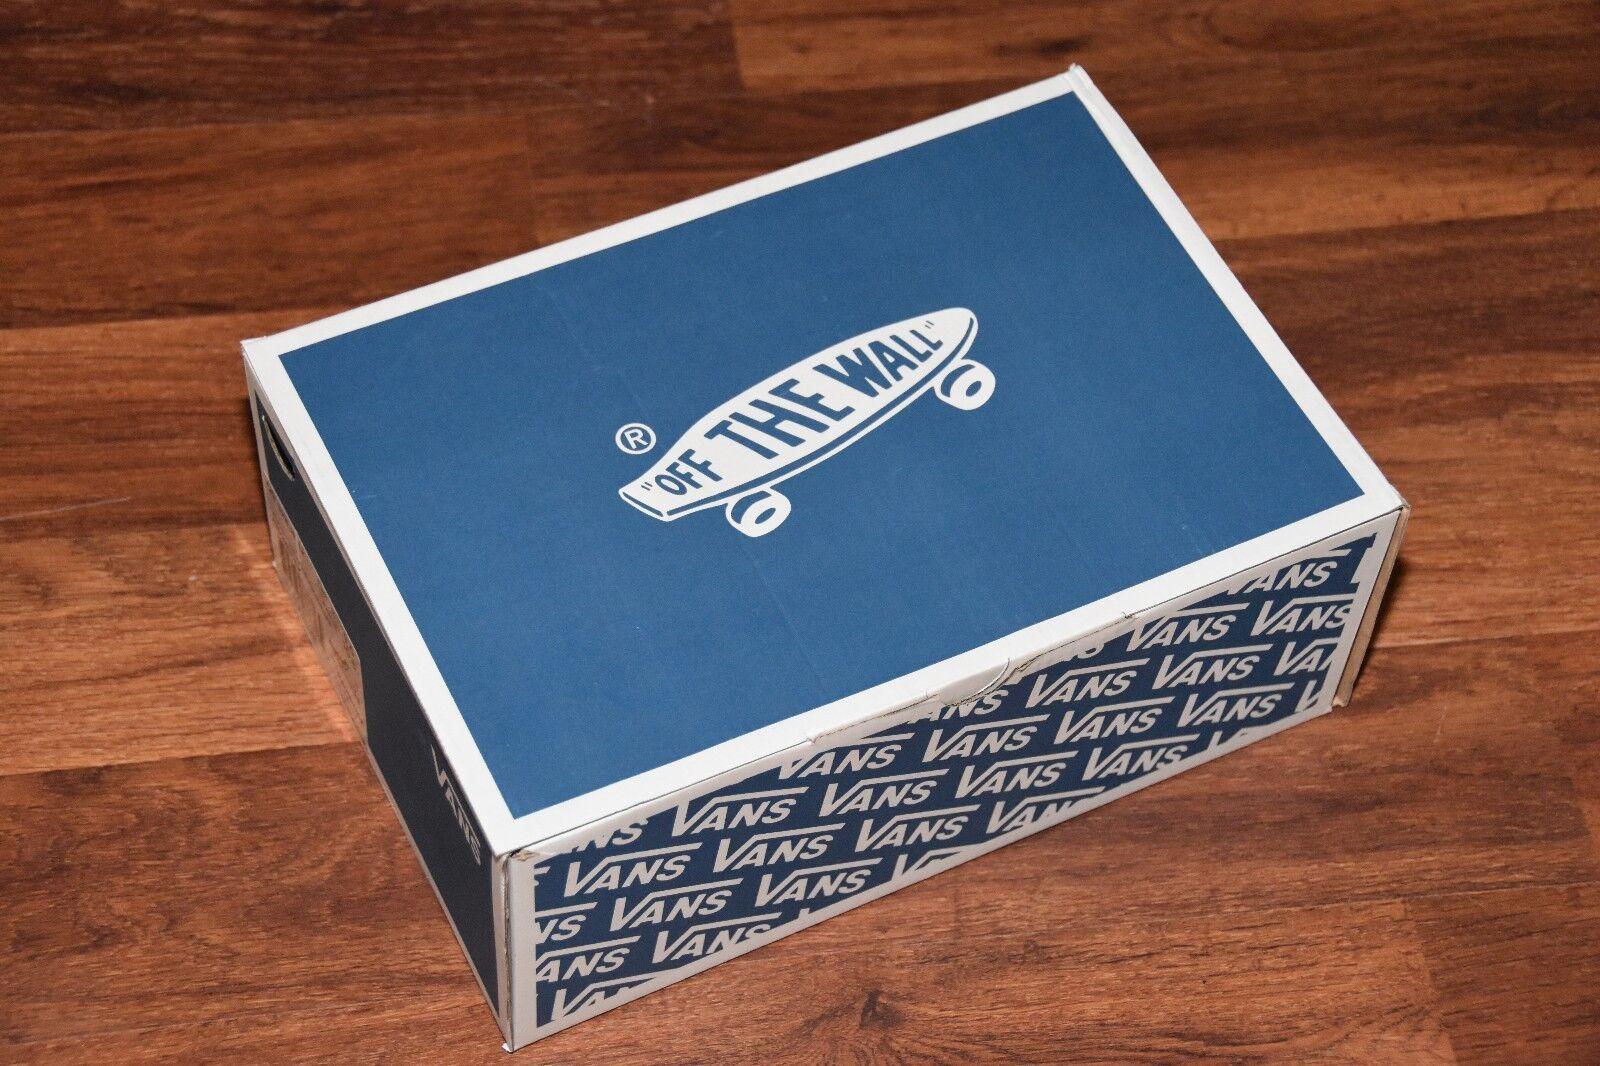 Vans Size OG SK8-HI LX 50th Anniversary Uomo Size Vans 8 Pelle Woven Checkerboard Check 49e966